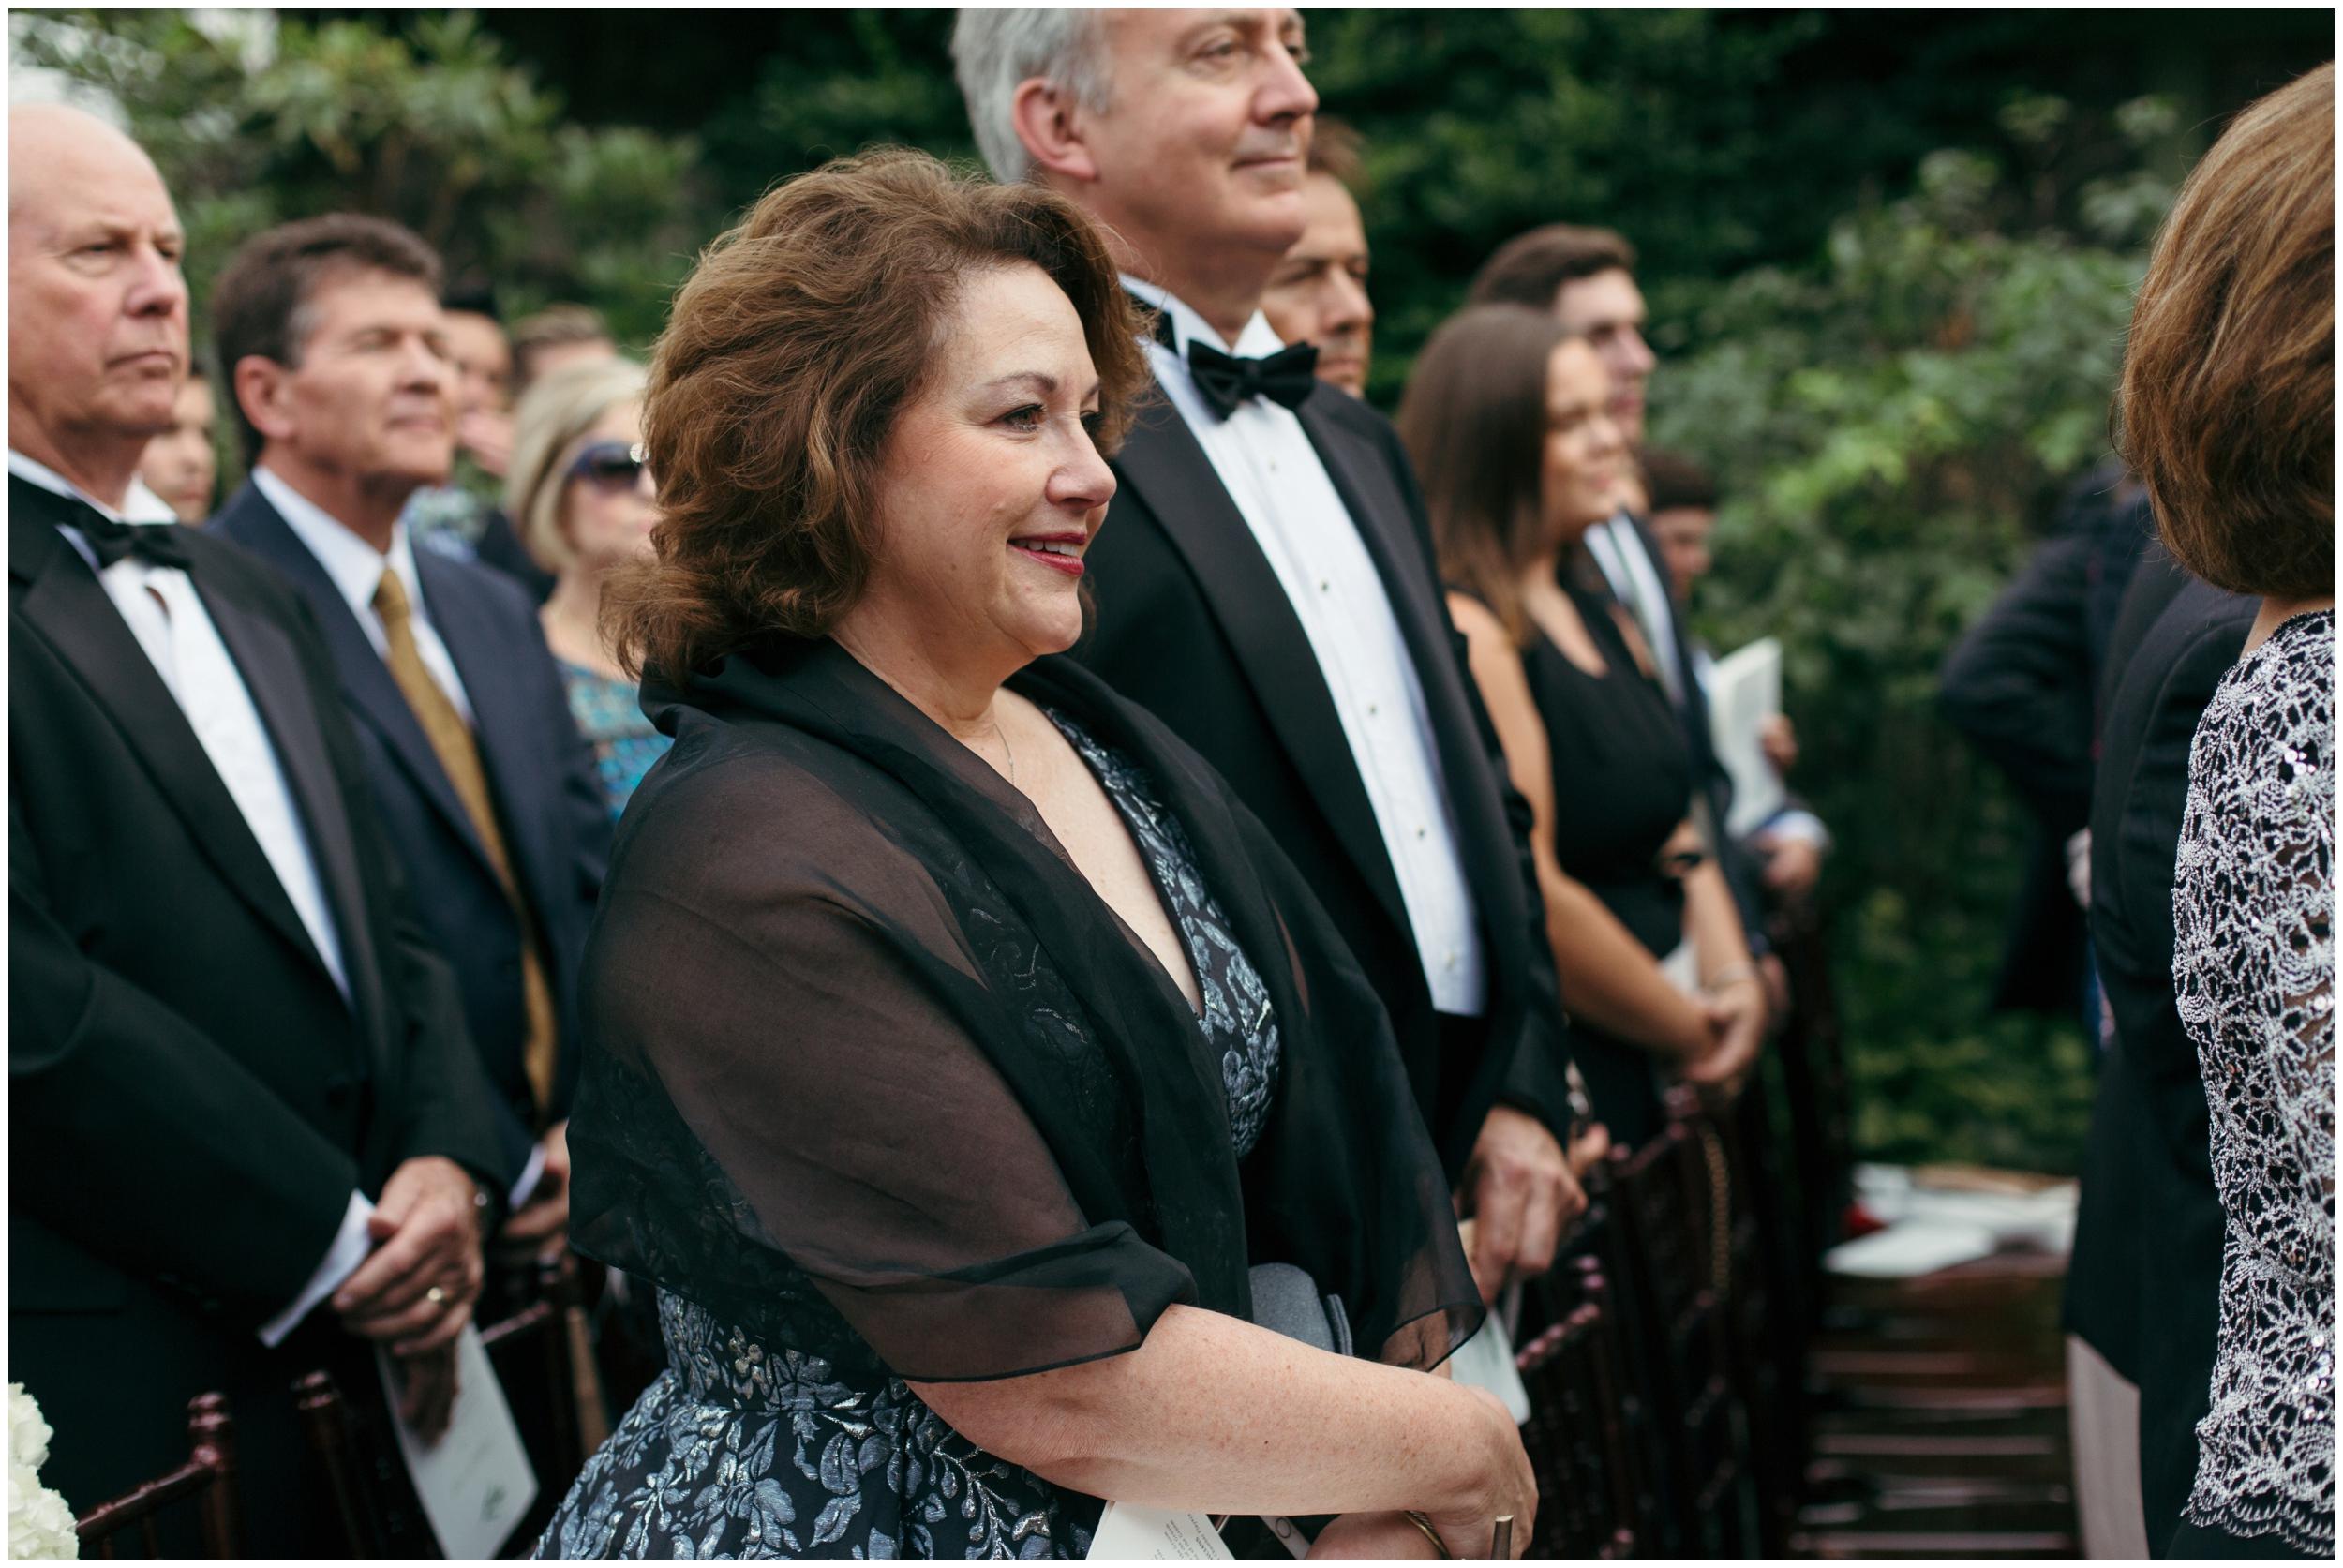 Willowdale-Estate-Wedding-Bailey-Q-Photo-Boston-Wedding-Photographer-036.JPG